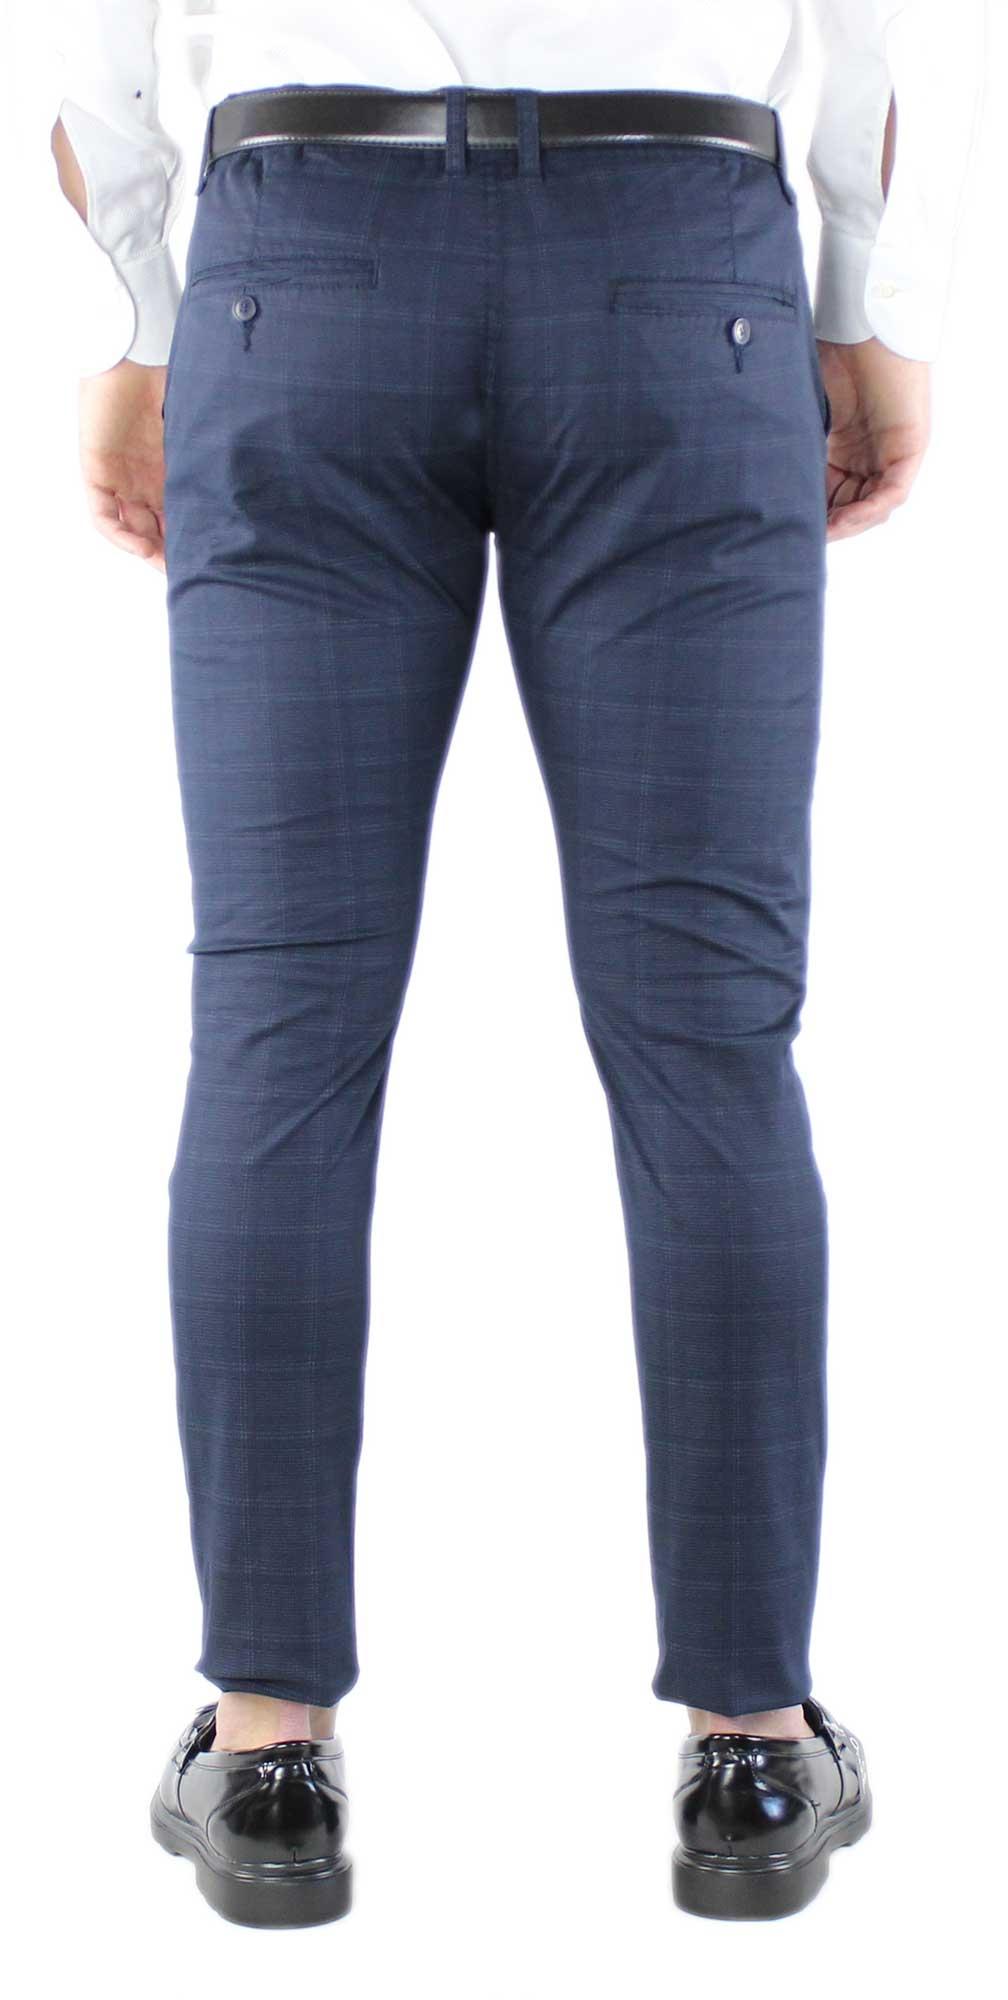 Pantaloni-Uomo-Chino-Silm-Fit-Estivi-a-Quadri-Pantalone-Elegante-Sartoriale miniatura 6